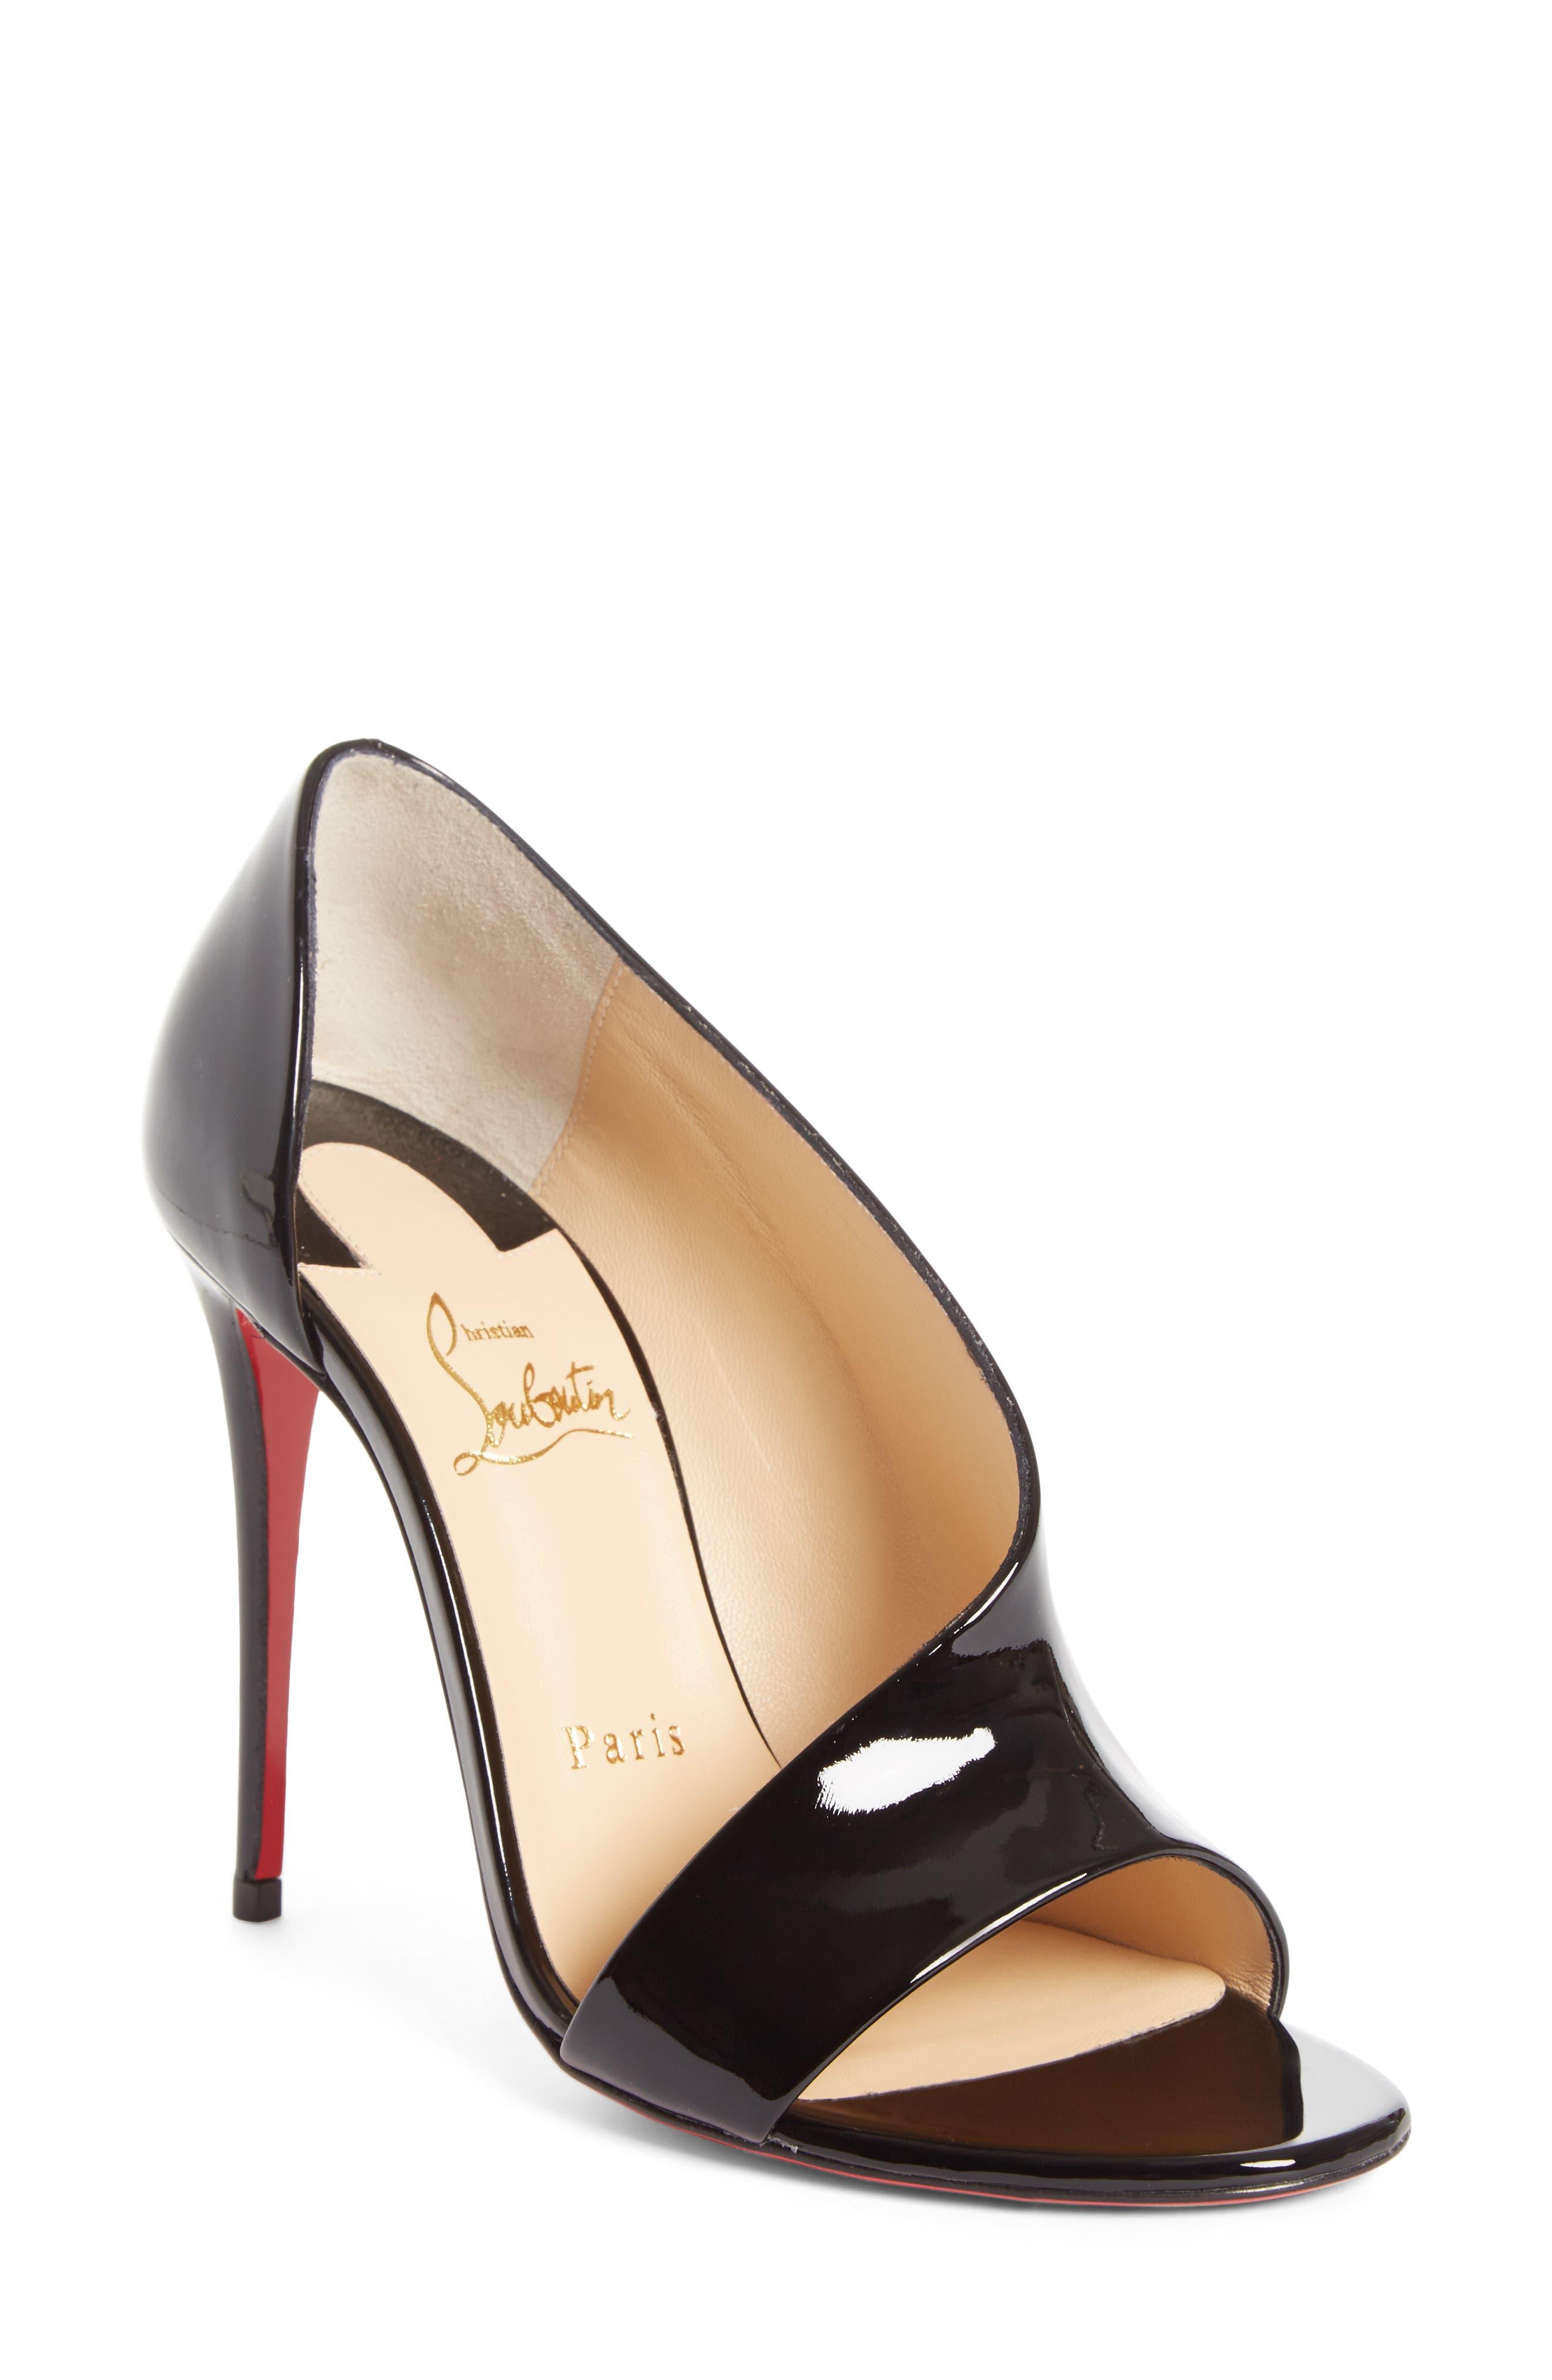 Phoebe Half d'Orsay Sandal,                         Main,                         color, Black Patent